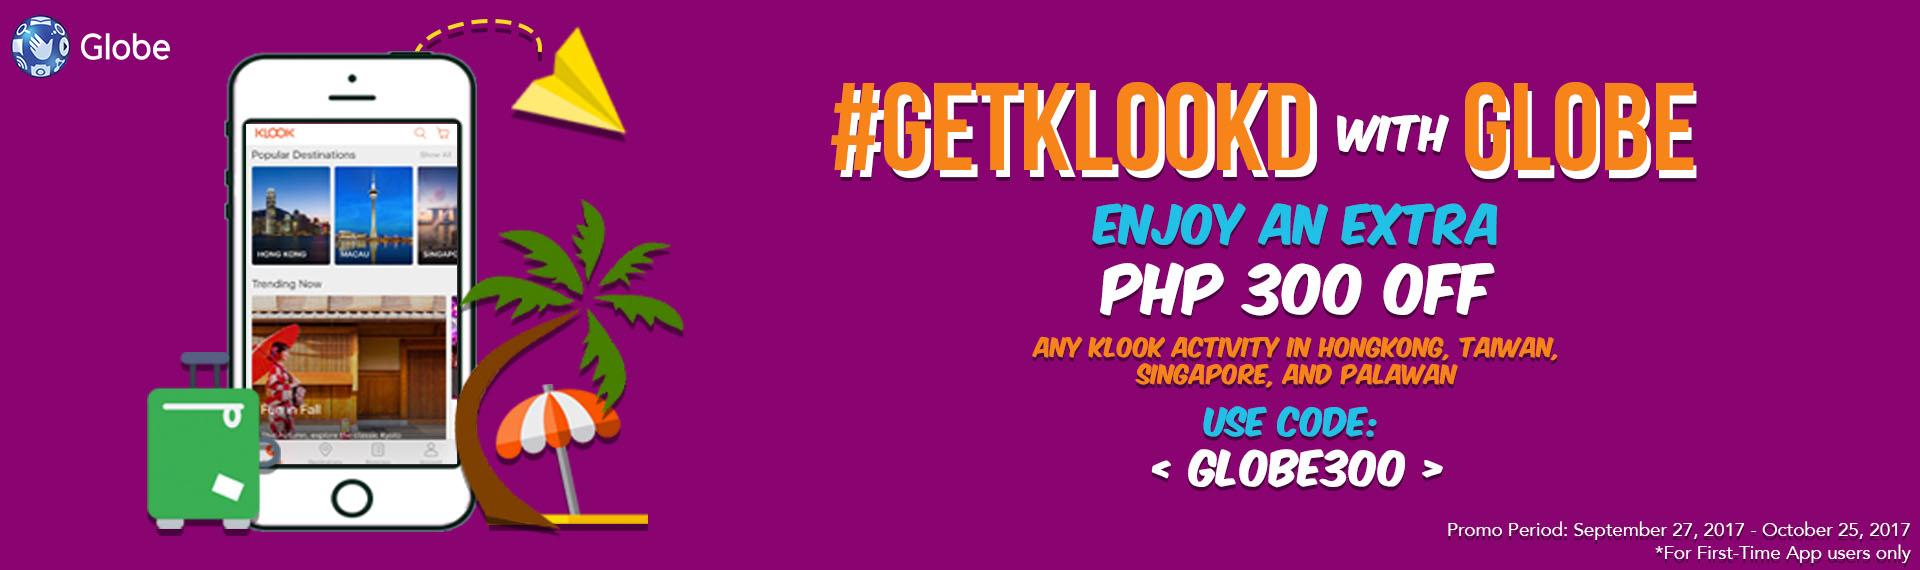 Klook x Globe - Klook